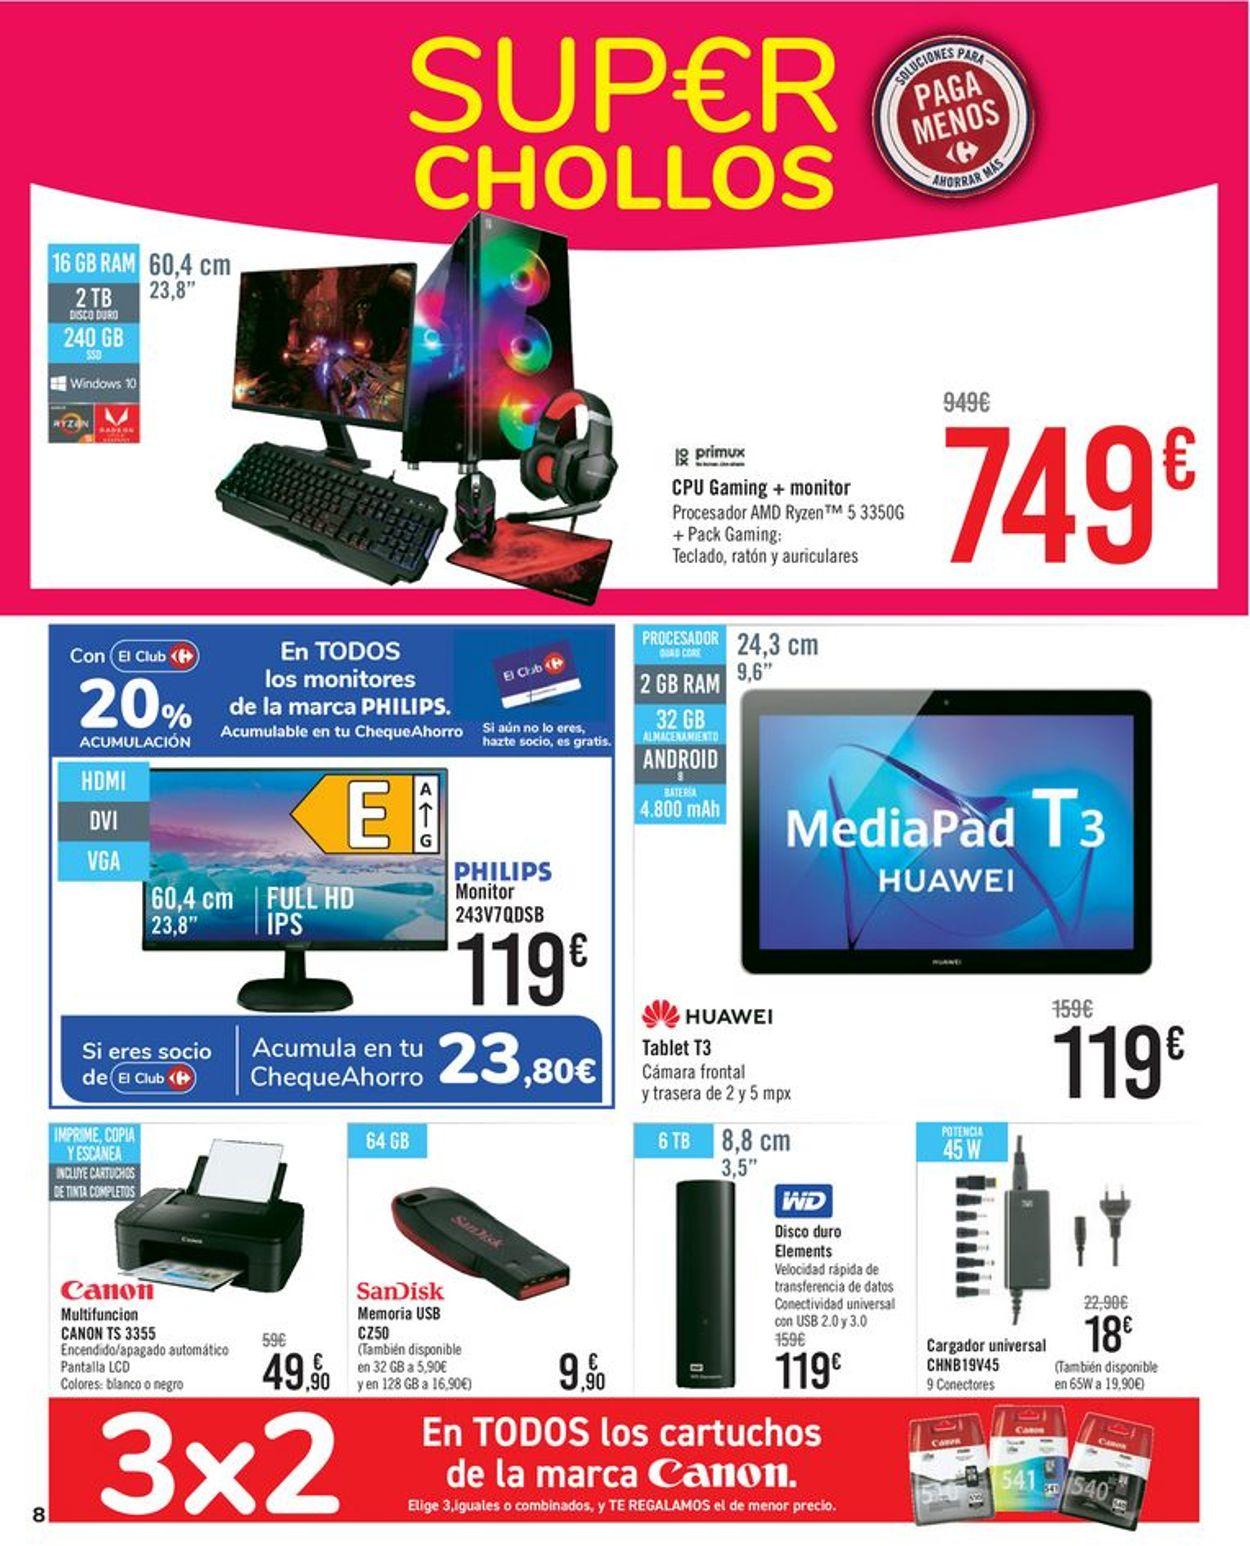 Carrefour Super Chollos Folleto - 16.04-26.04.2021 (Página 8)